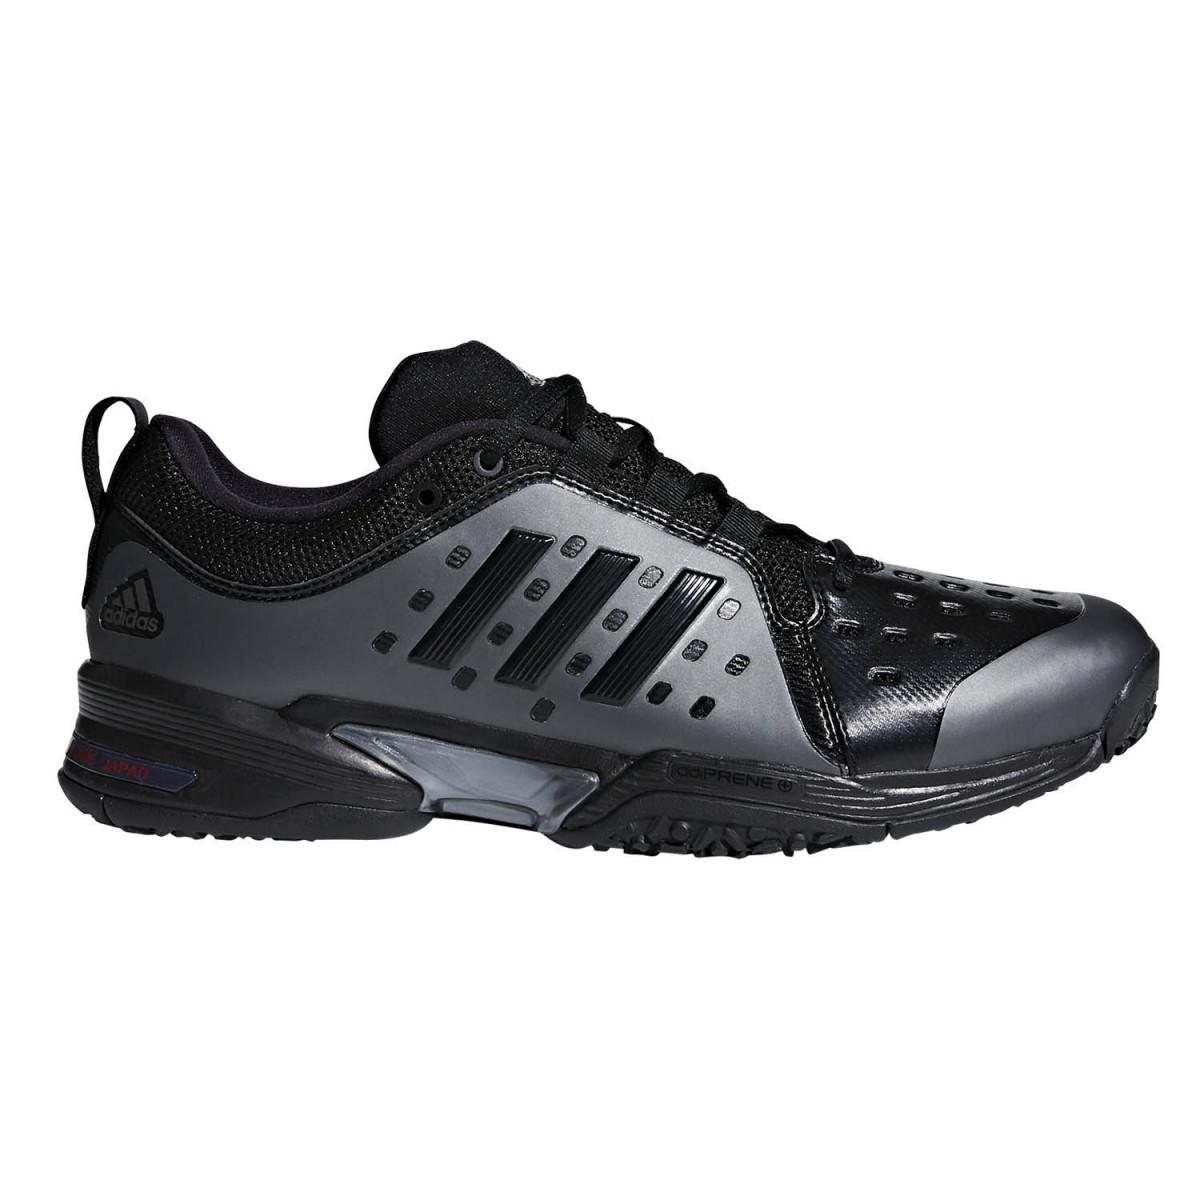 lowest price db670 a3de4 Zapatillas Adidas Barricade Japan